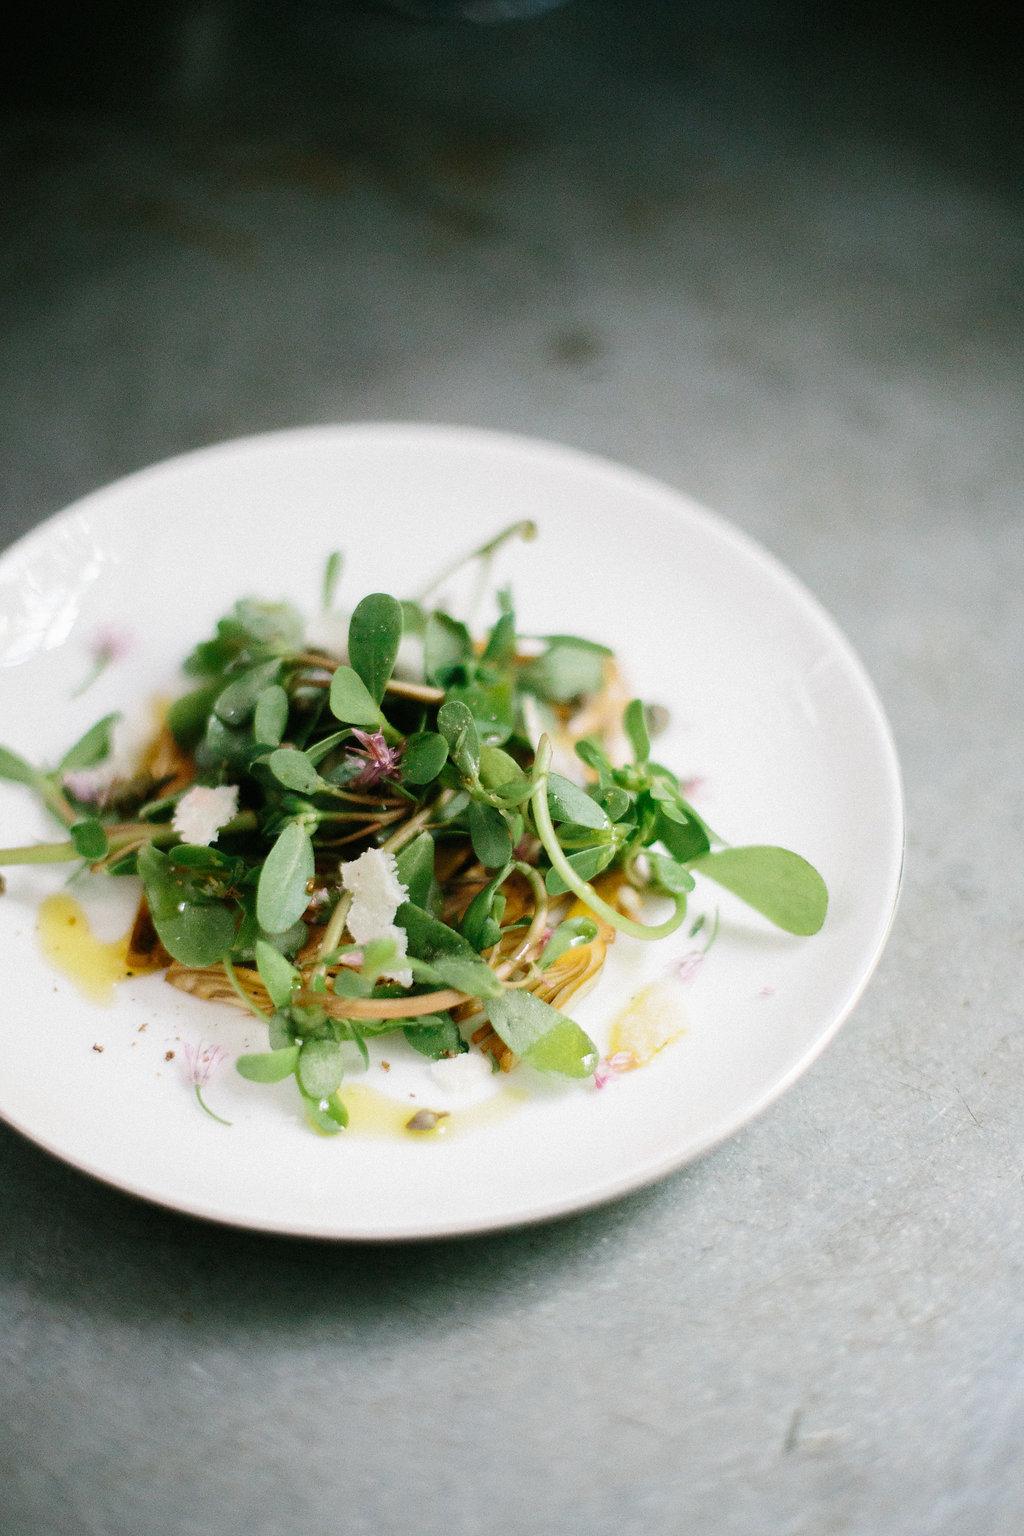 Photography: Maya Marechal. Chef: Kalice Brun